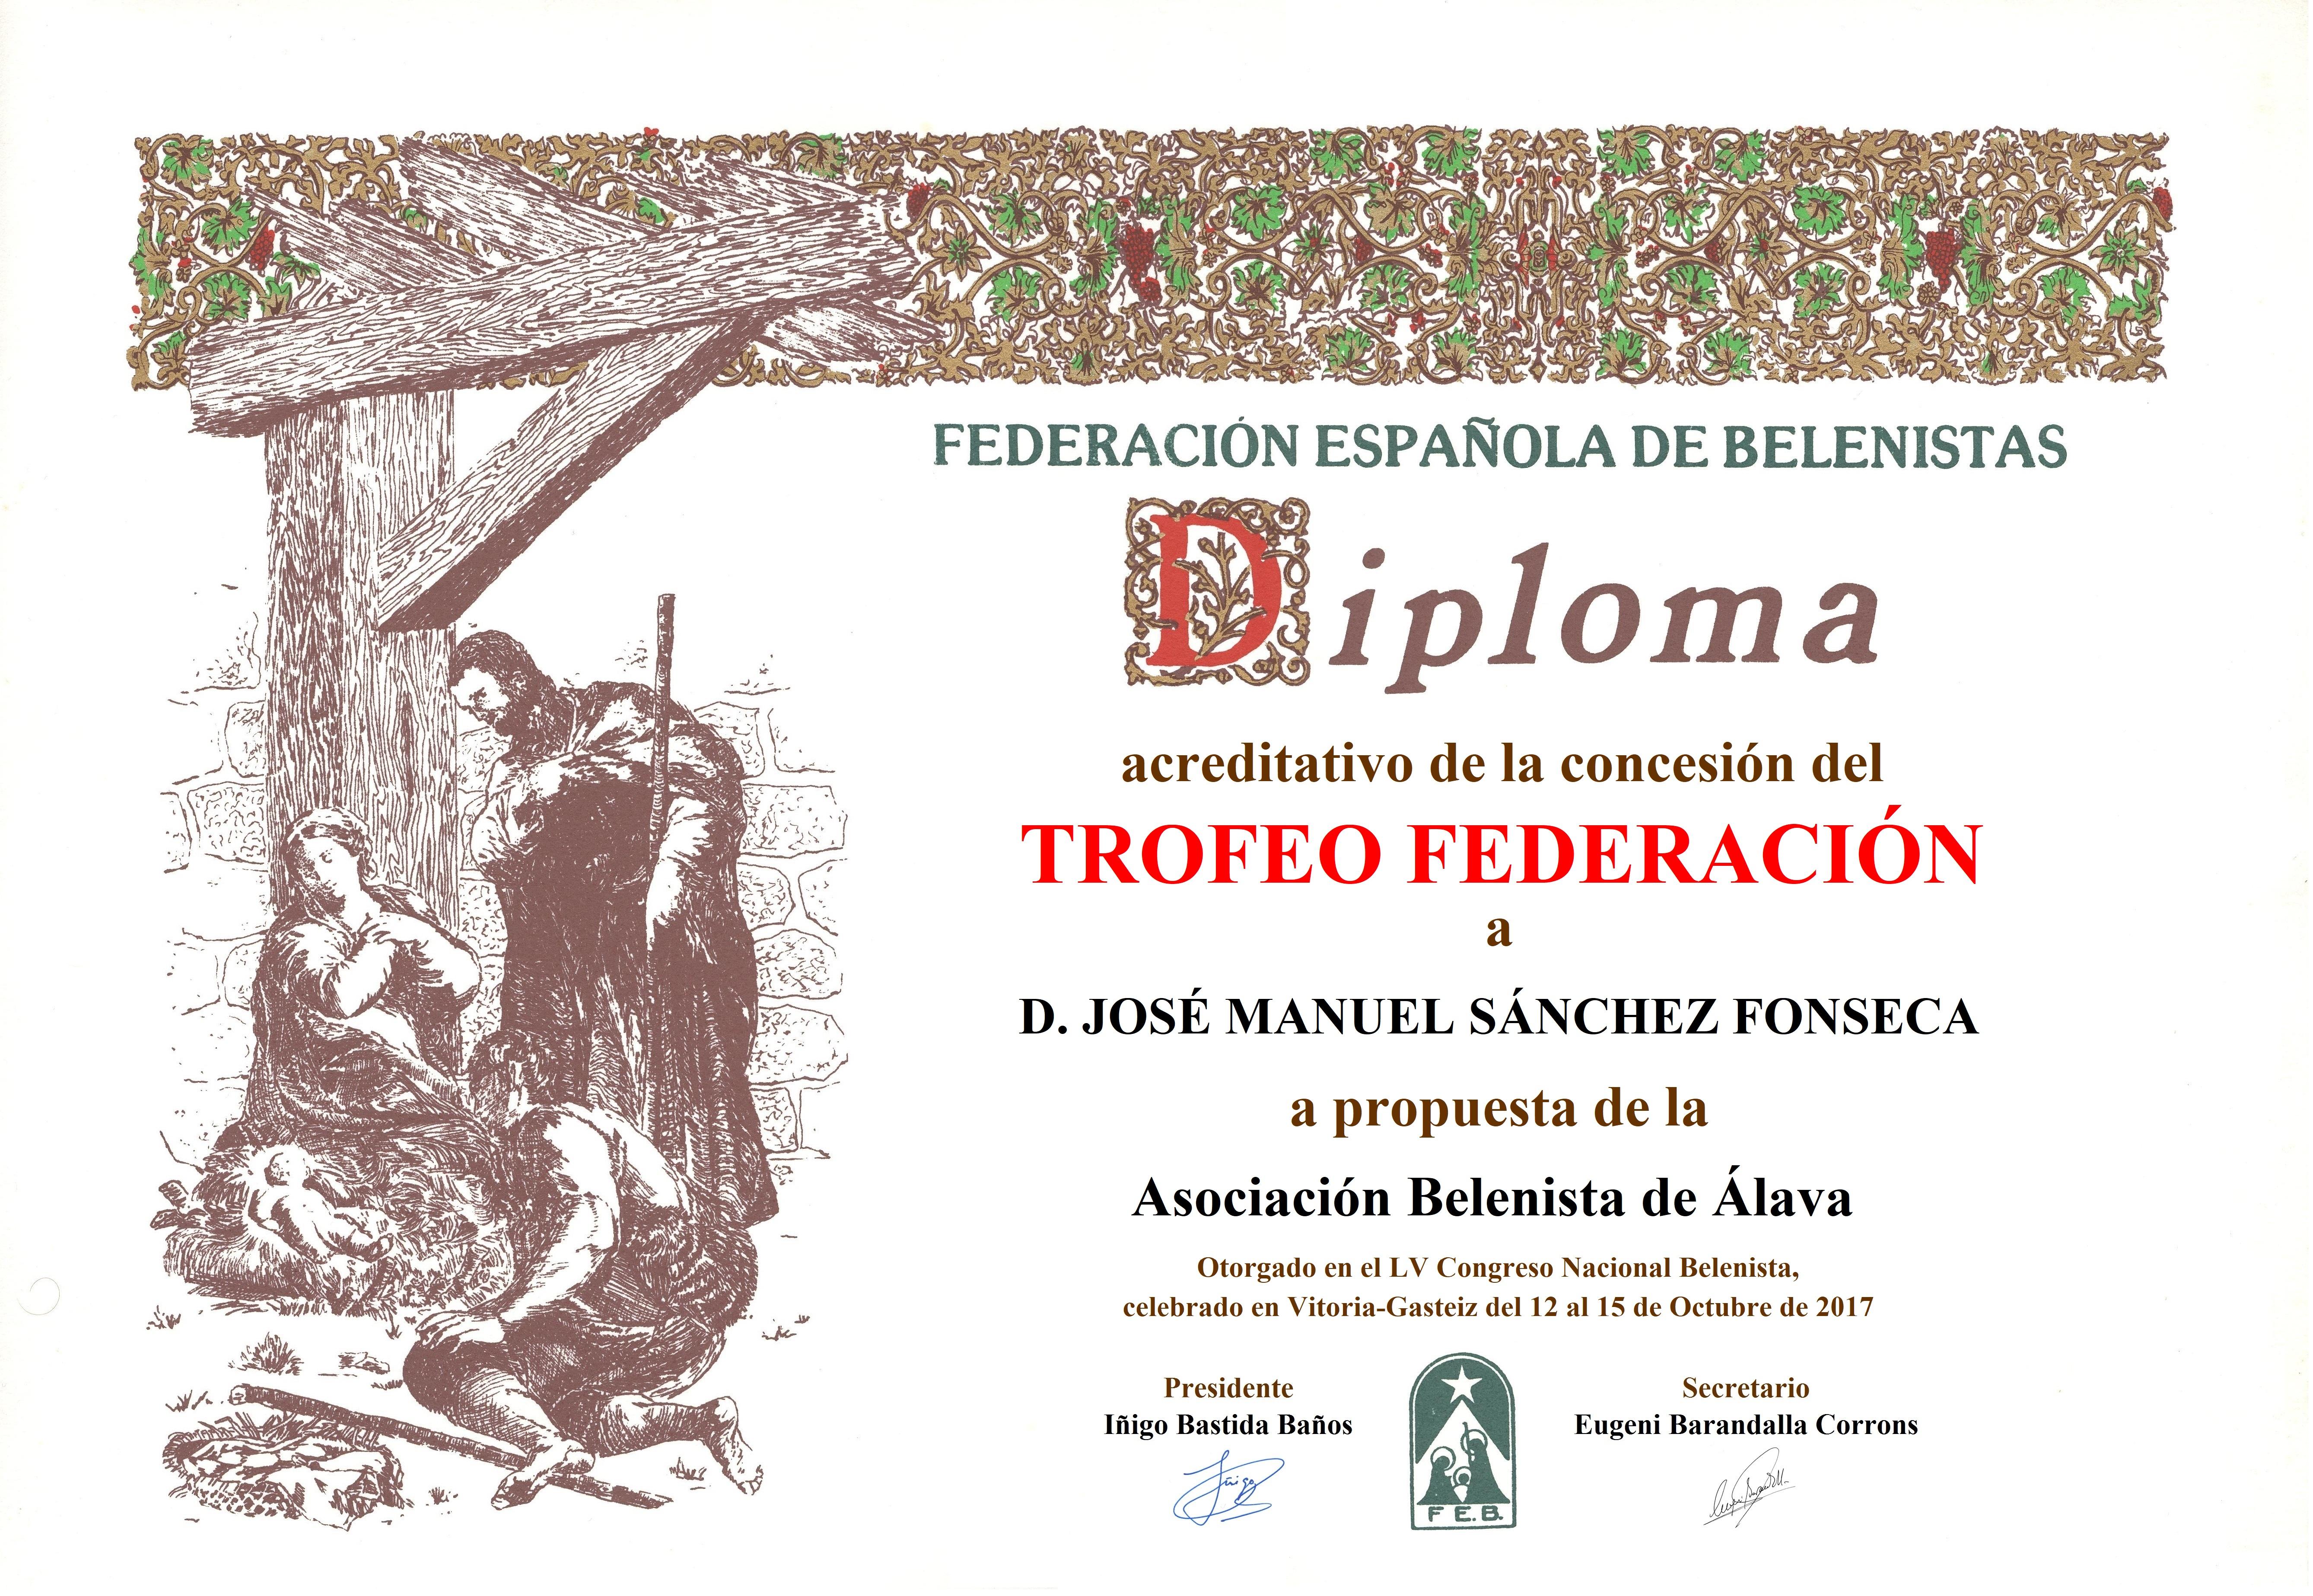 José Manuel Sánchez Fonseca - Diploma Trofeo FEB 2017